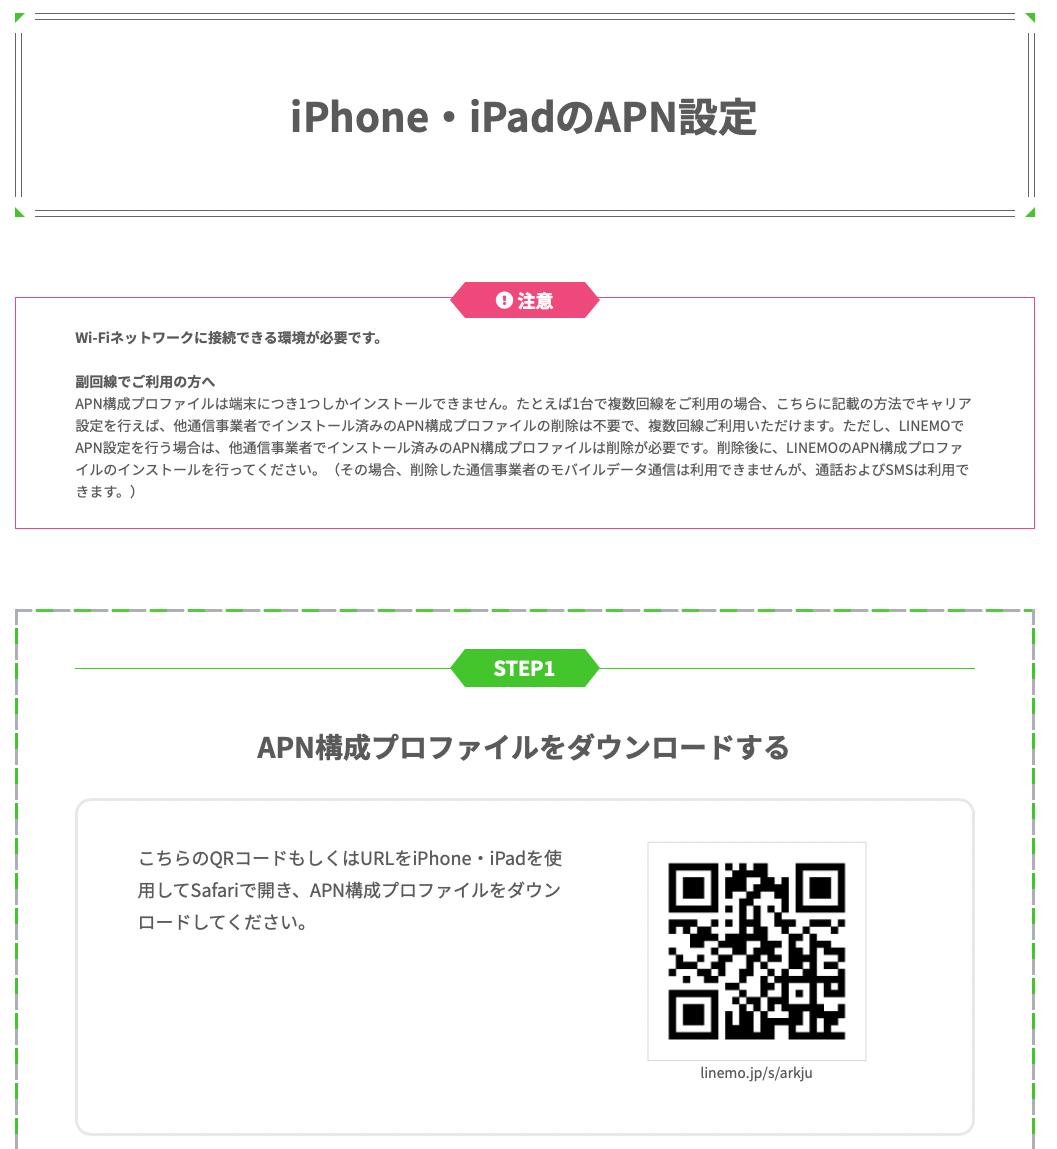 f:id:NoName1109:20210518221811p:plain:w350